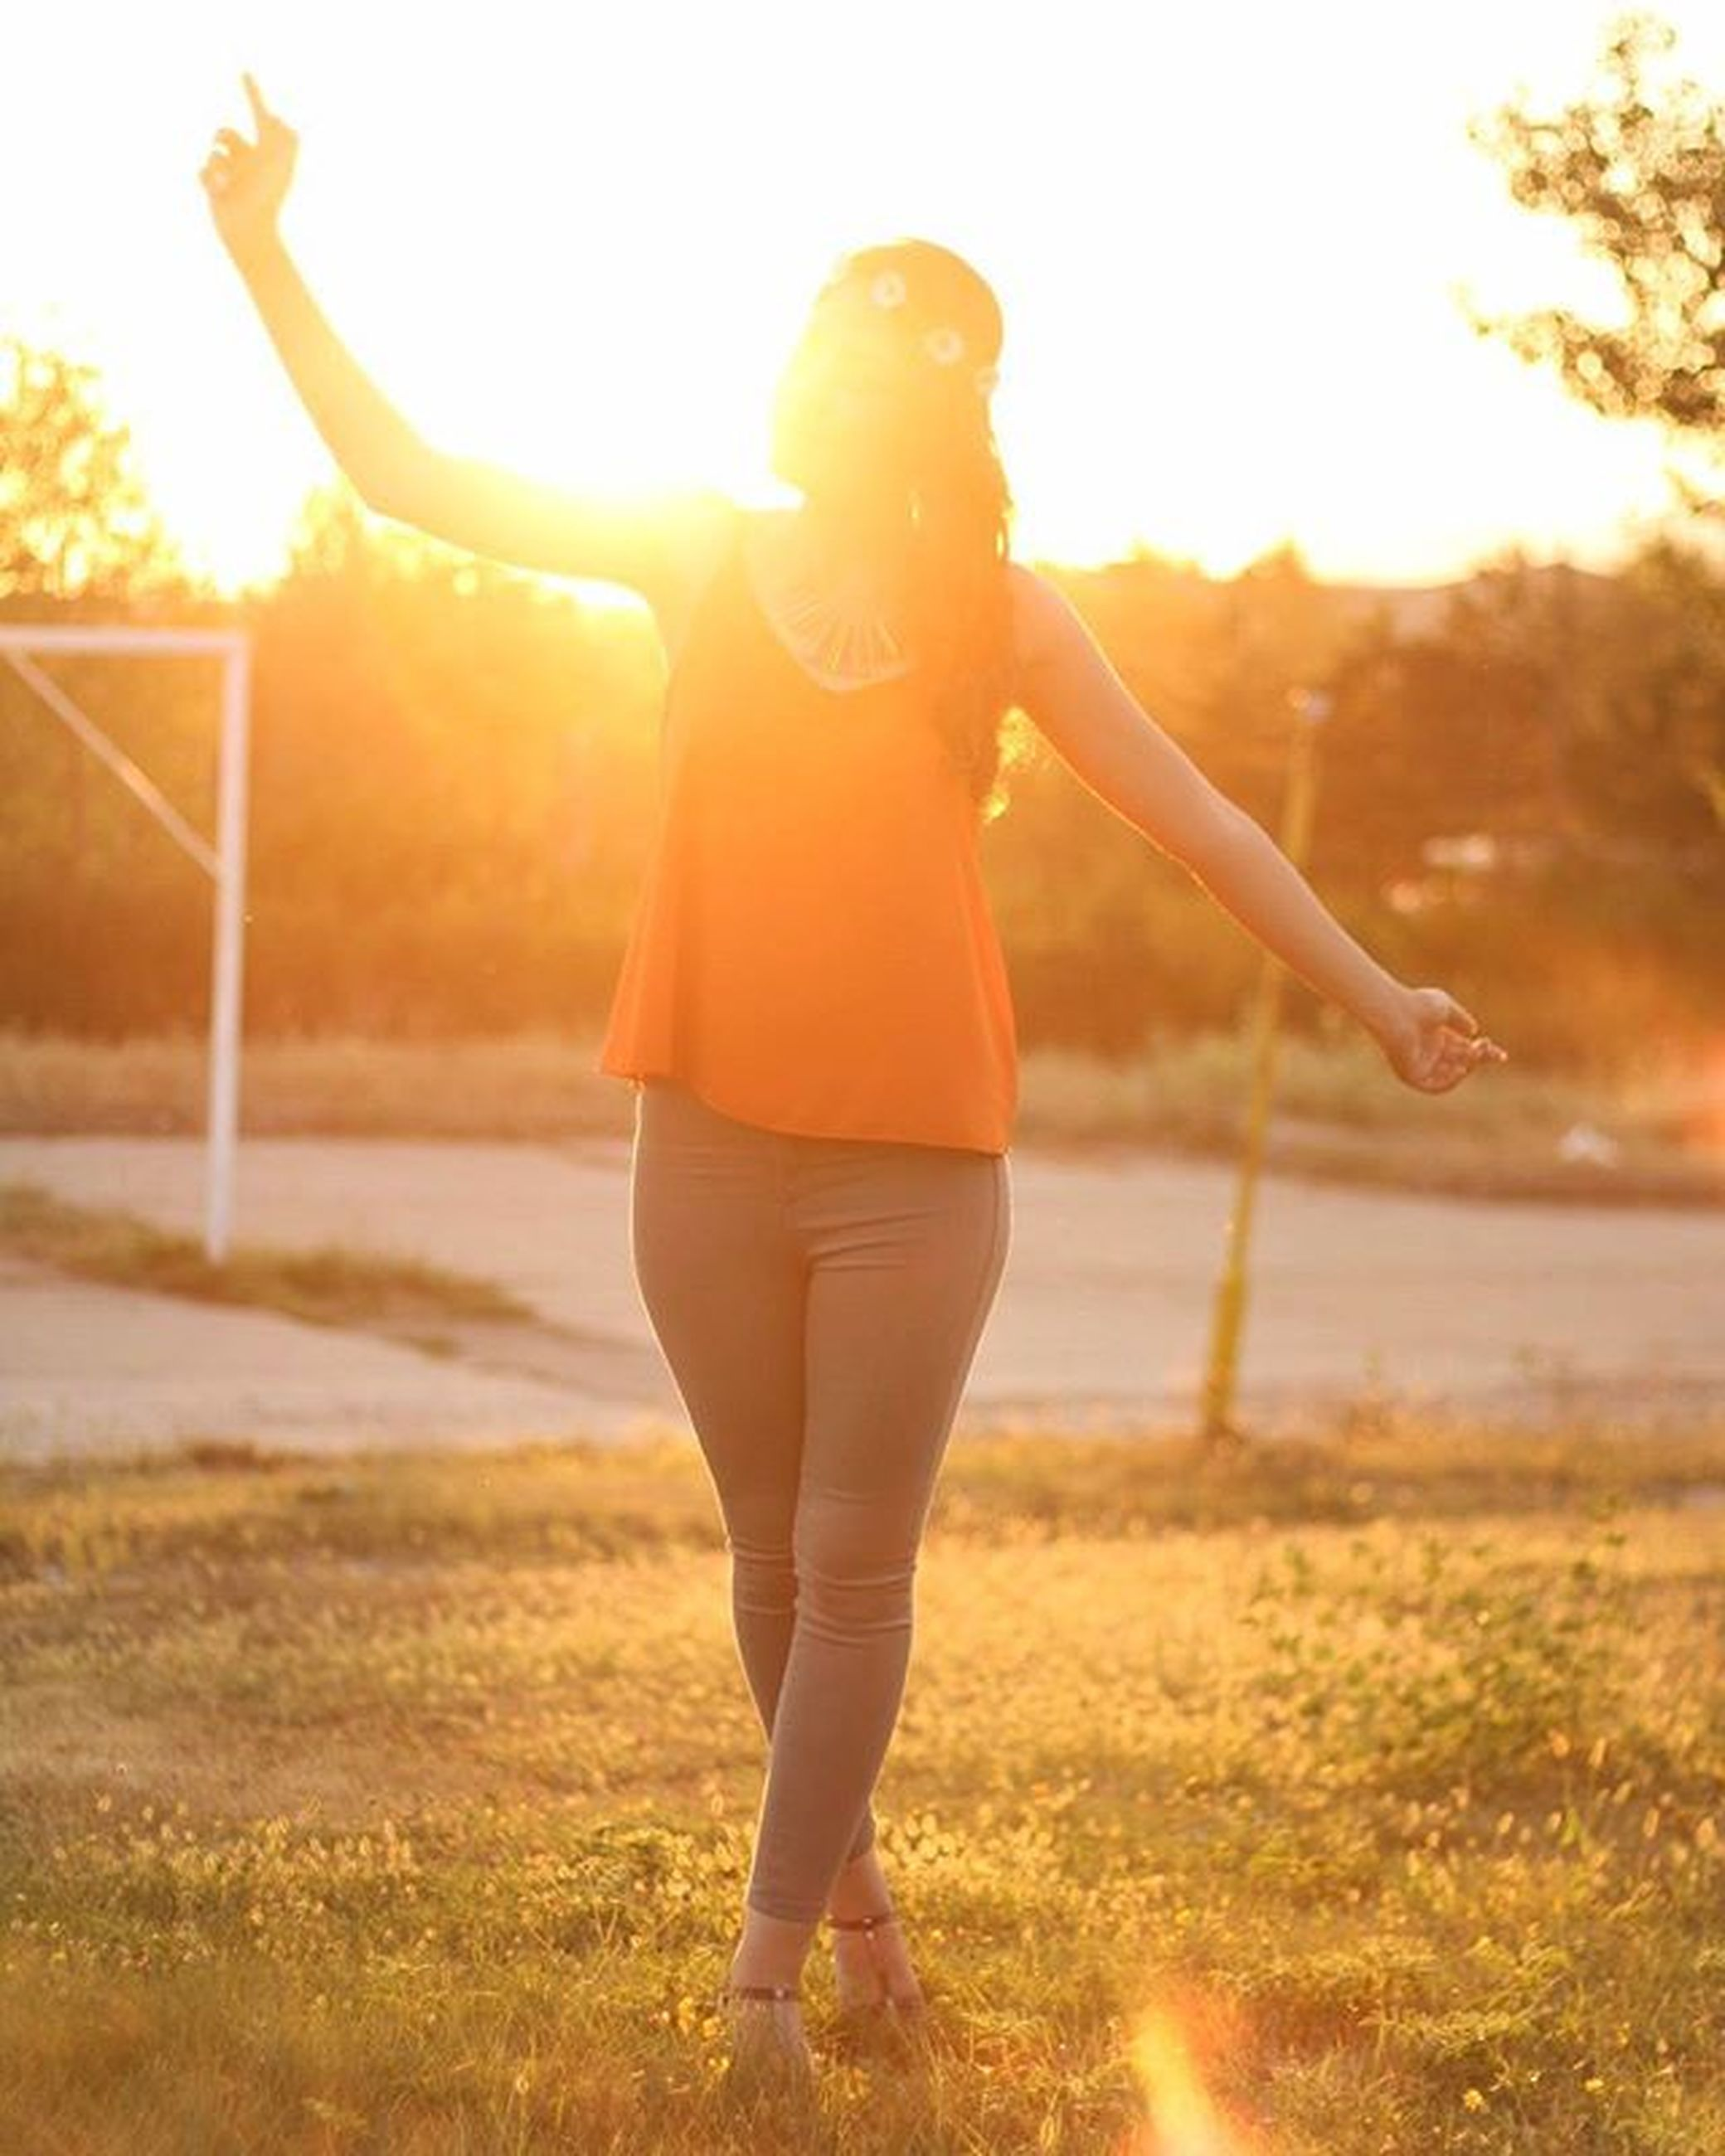 lifestyles, full length, leisure activity, sun, sunlight, sunset, sunbeam, lens flare, casual clothing, standing, grass, sky, person, enjoyment, field, carefree, childhood, fun